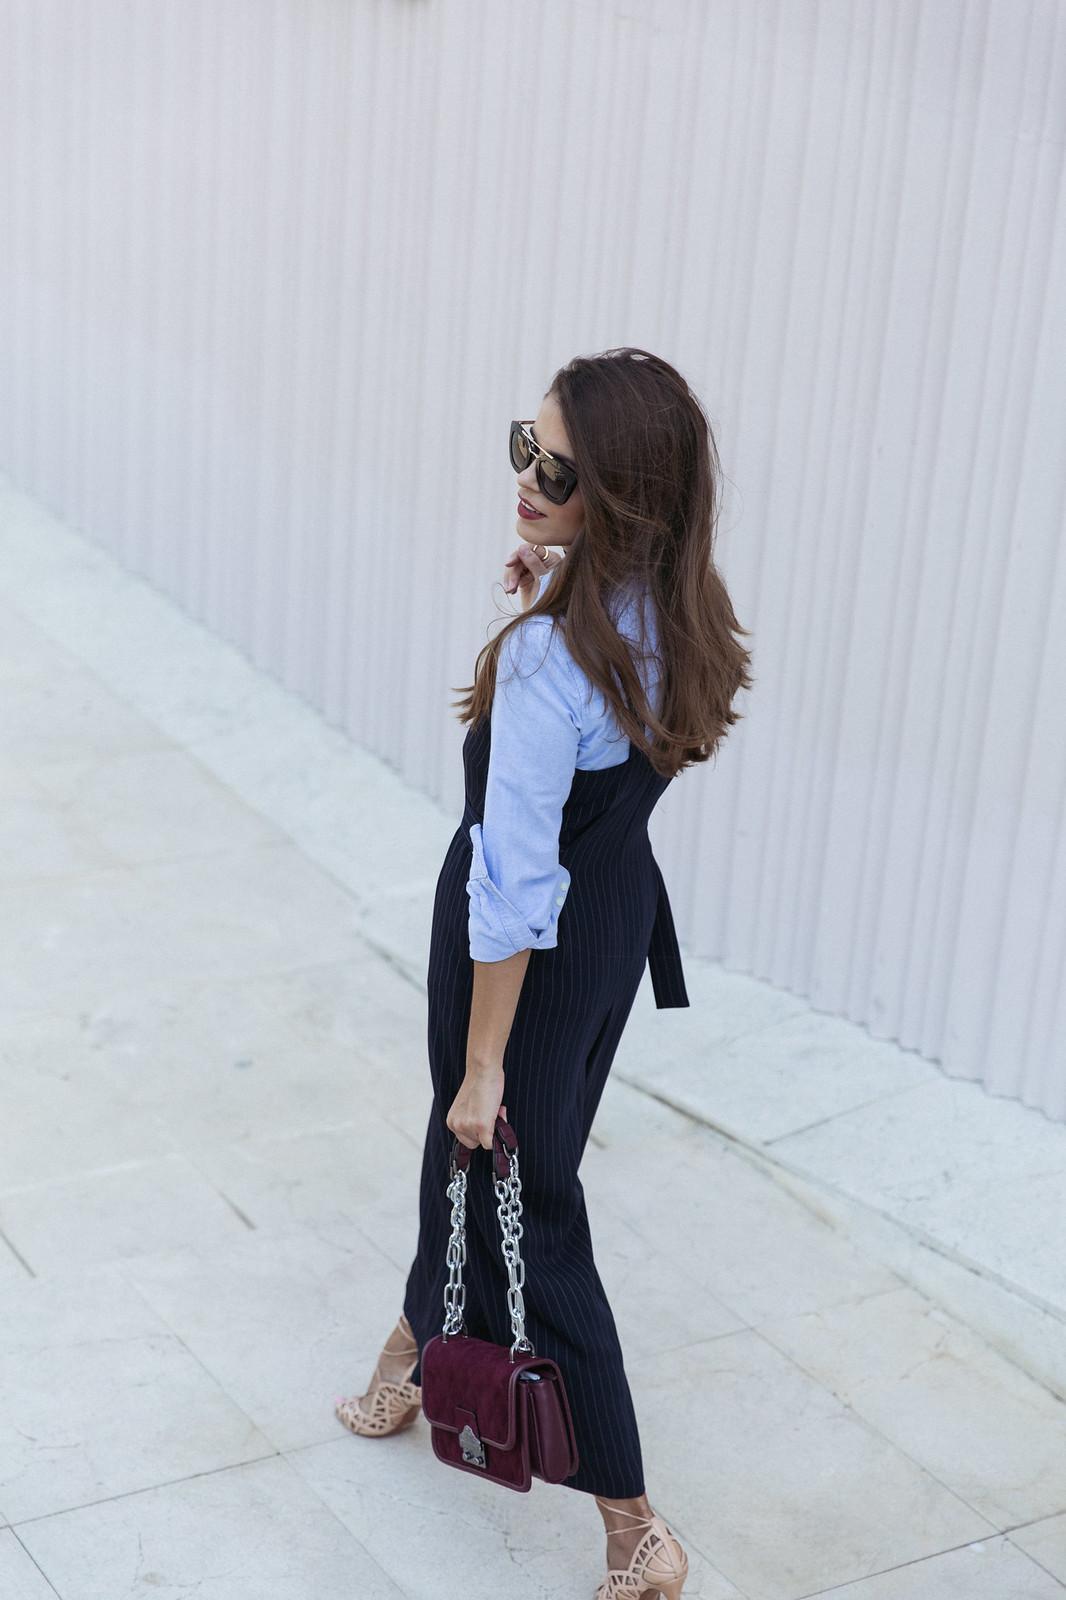 Jessie Chanes Seams for a desire - Pinstripped suit topshop heeled sandals schutz parfois bag  -11